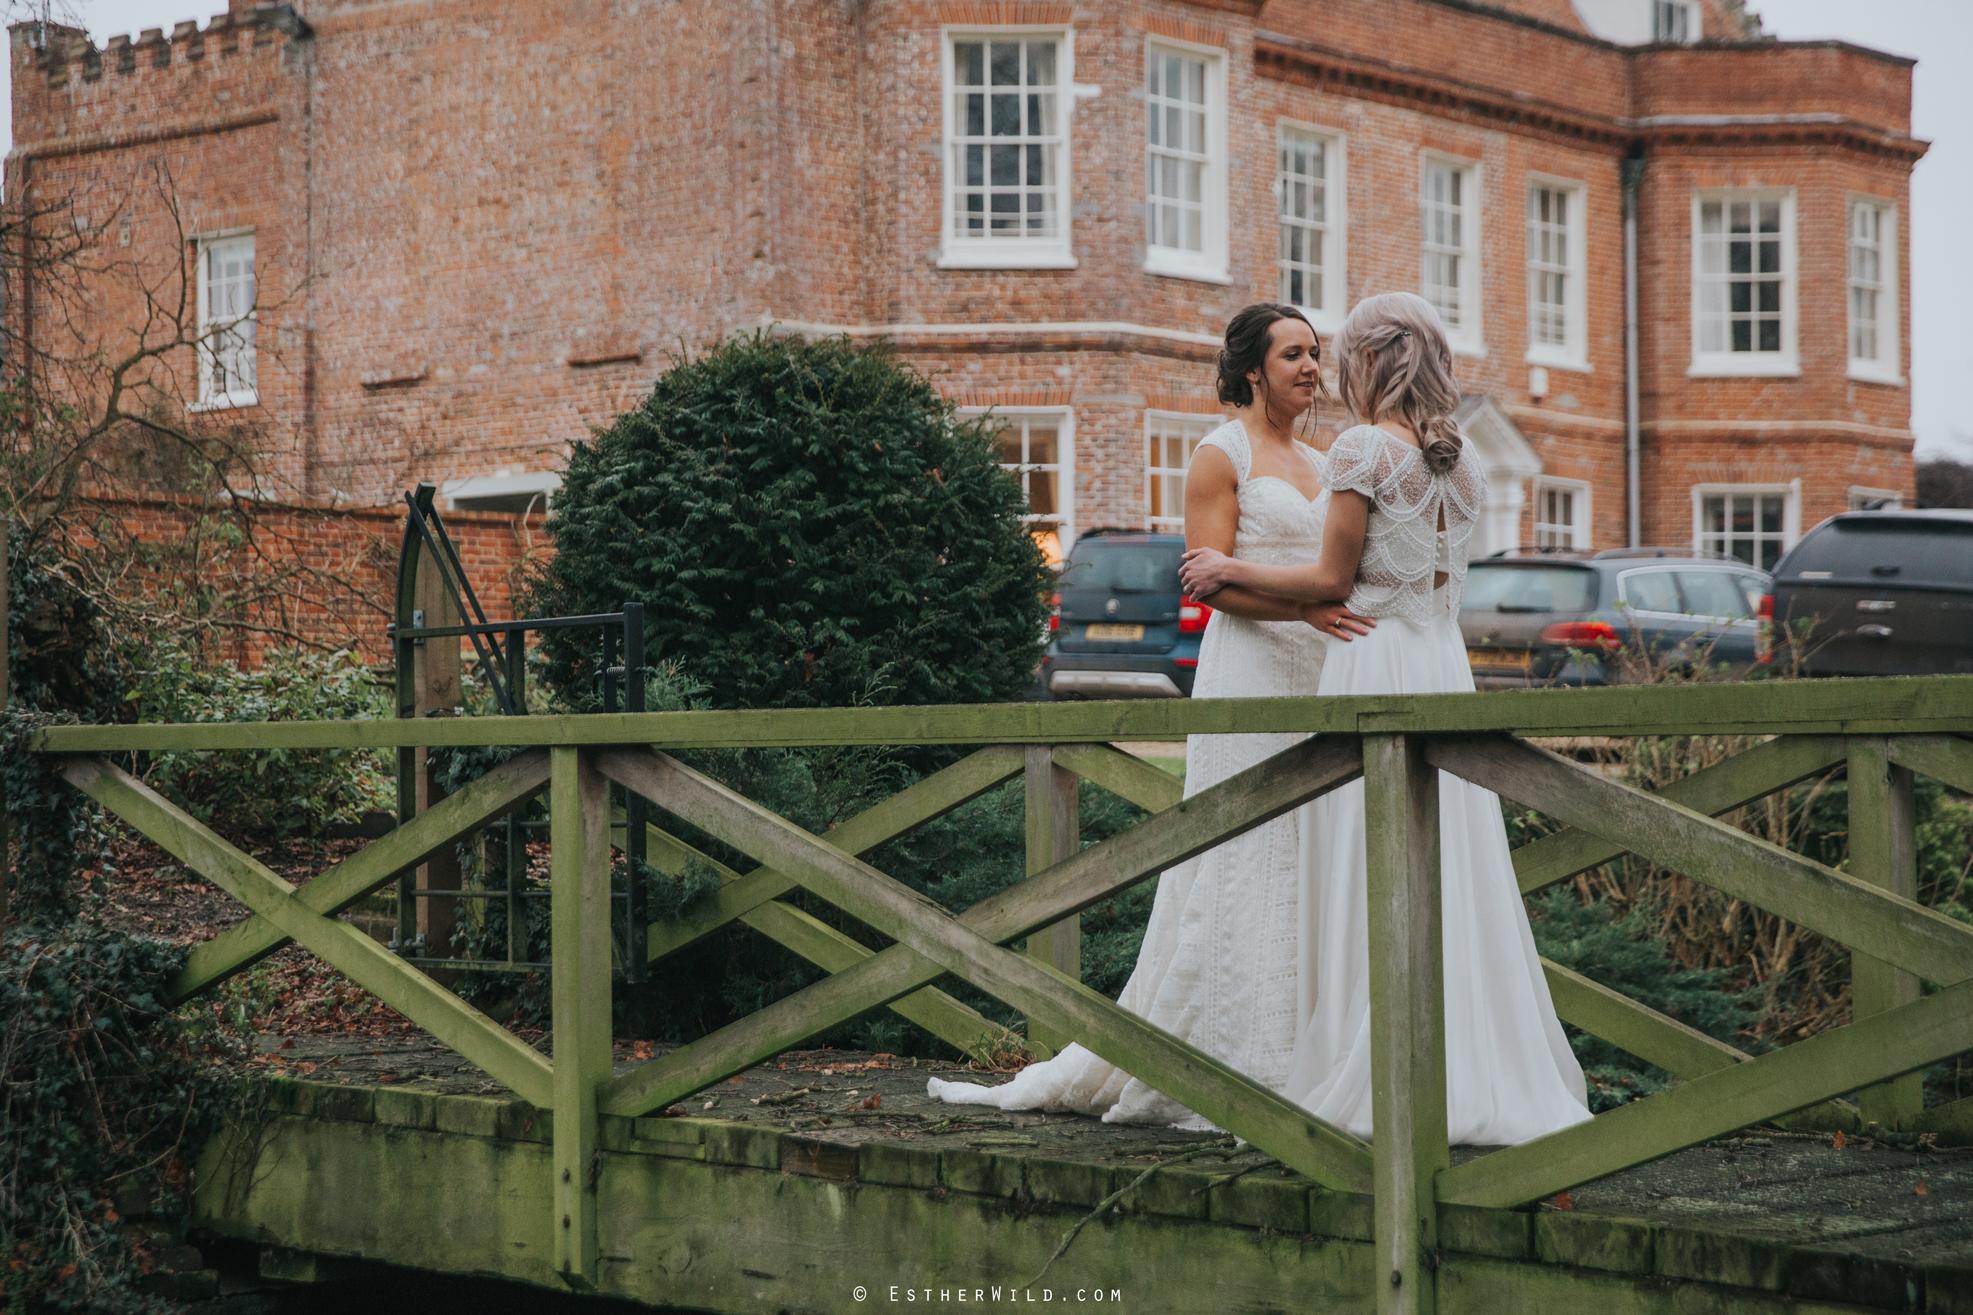 Elms_Barn_Weddings_Suffolk_Photographer_Copyright_Esther_Wild_IMG_1986.jpg